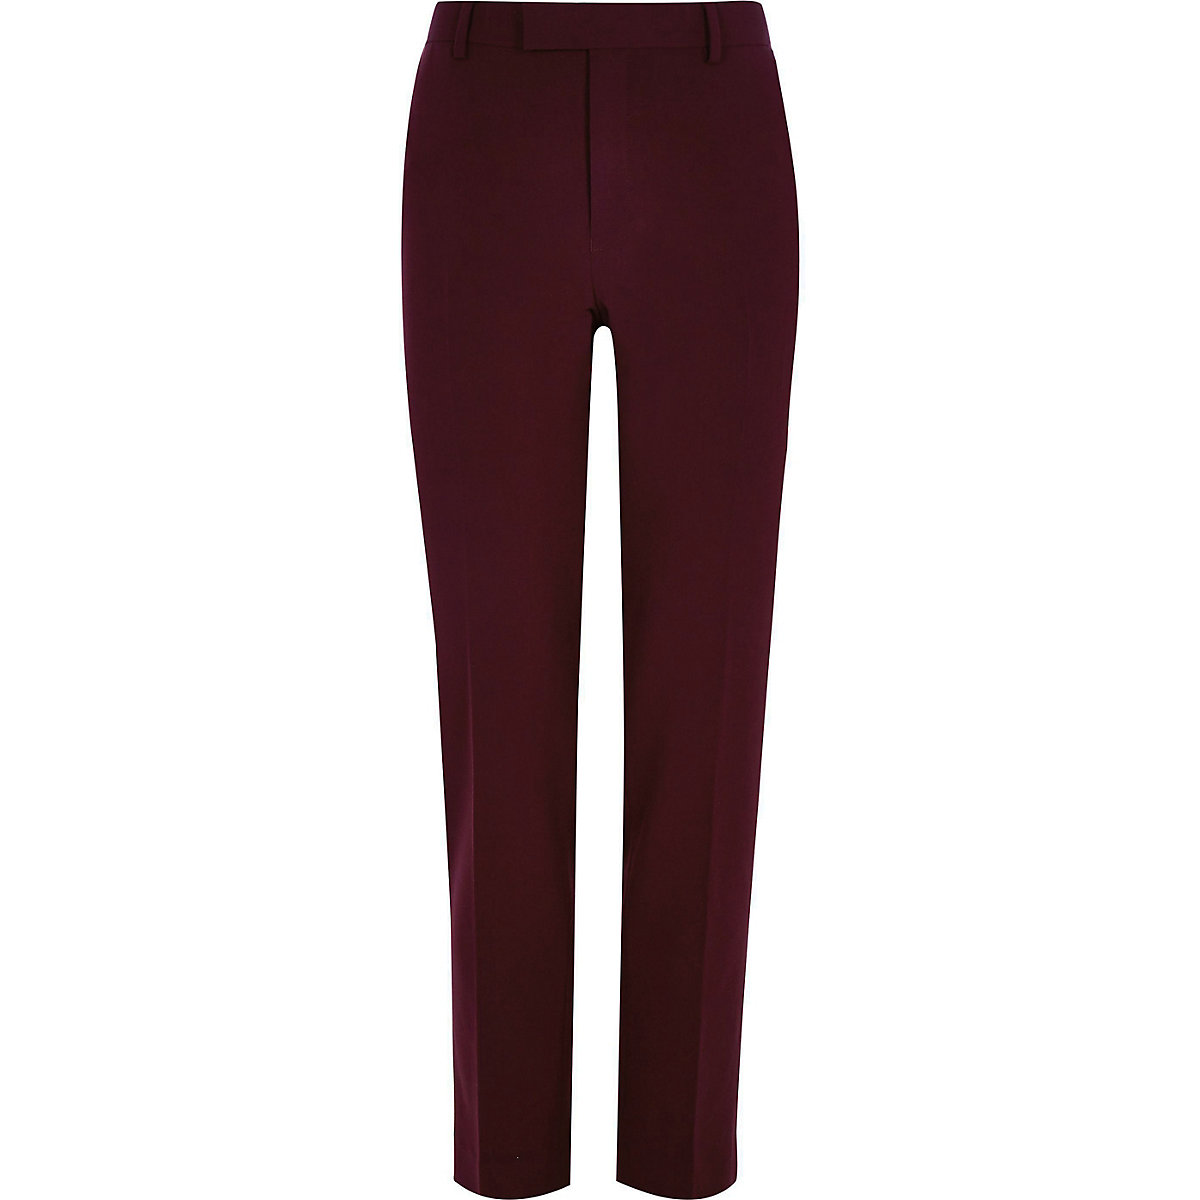 Big and Tall – Pantalon de costume rouge foncé